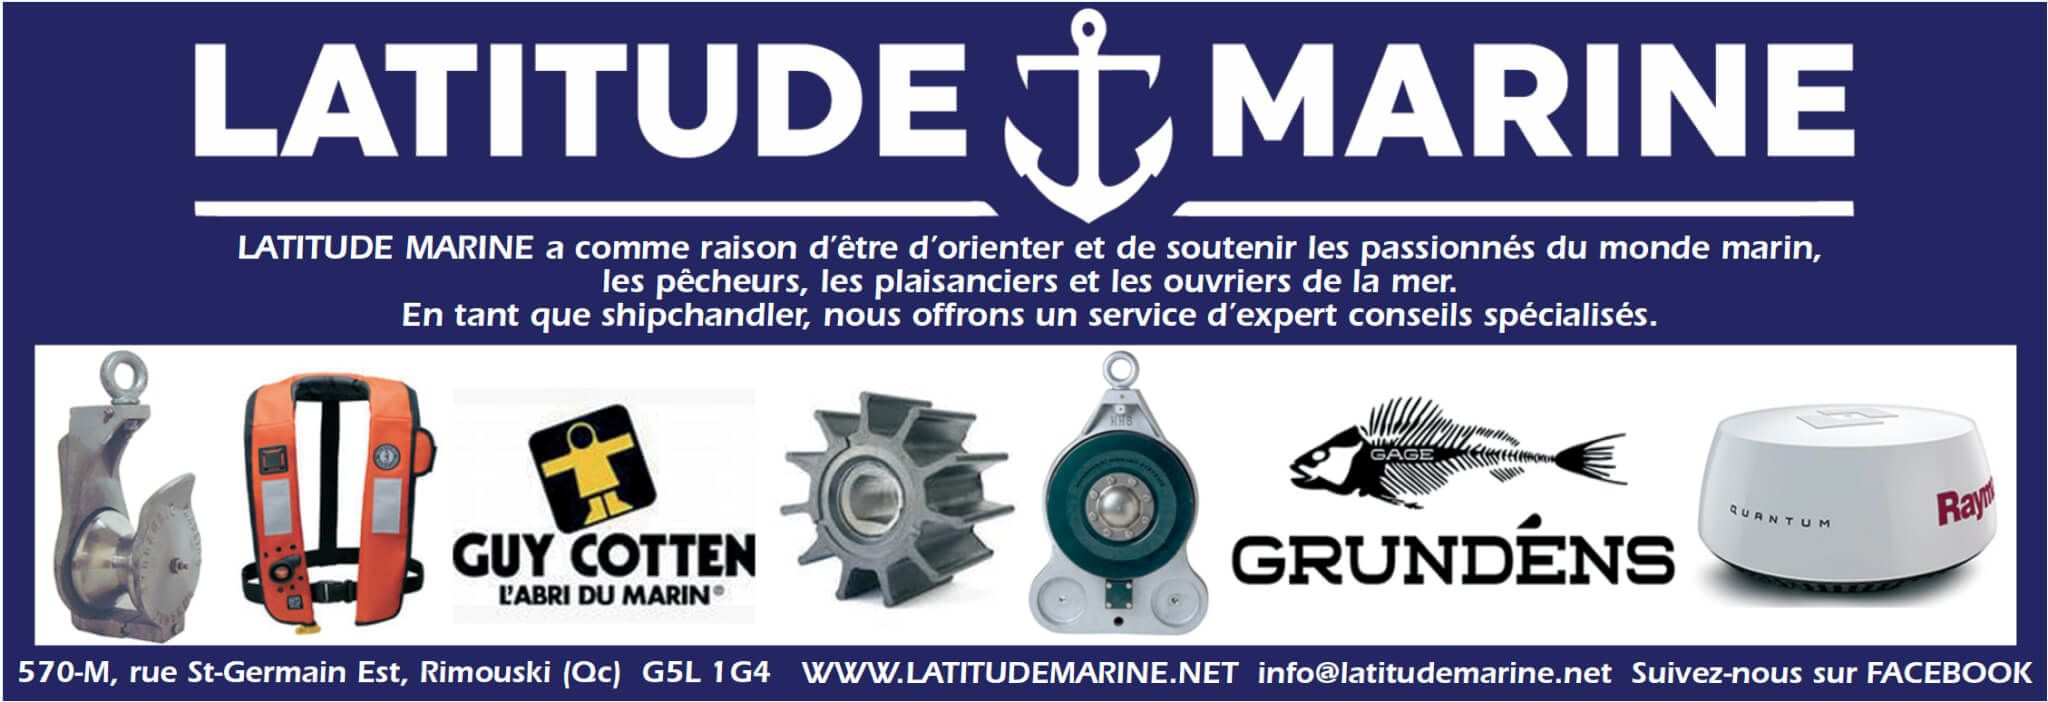 Latitude Marine